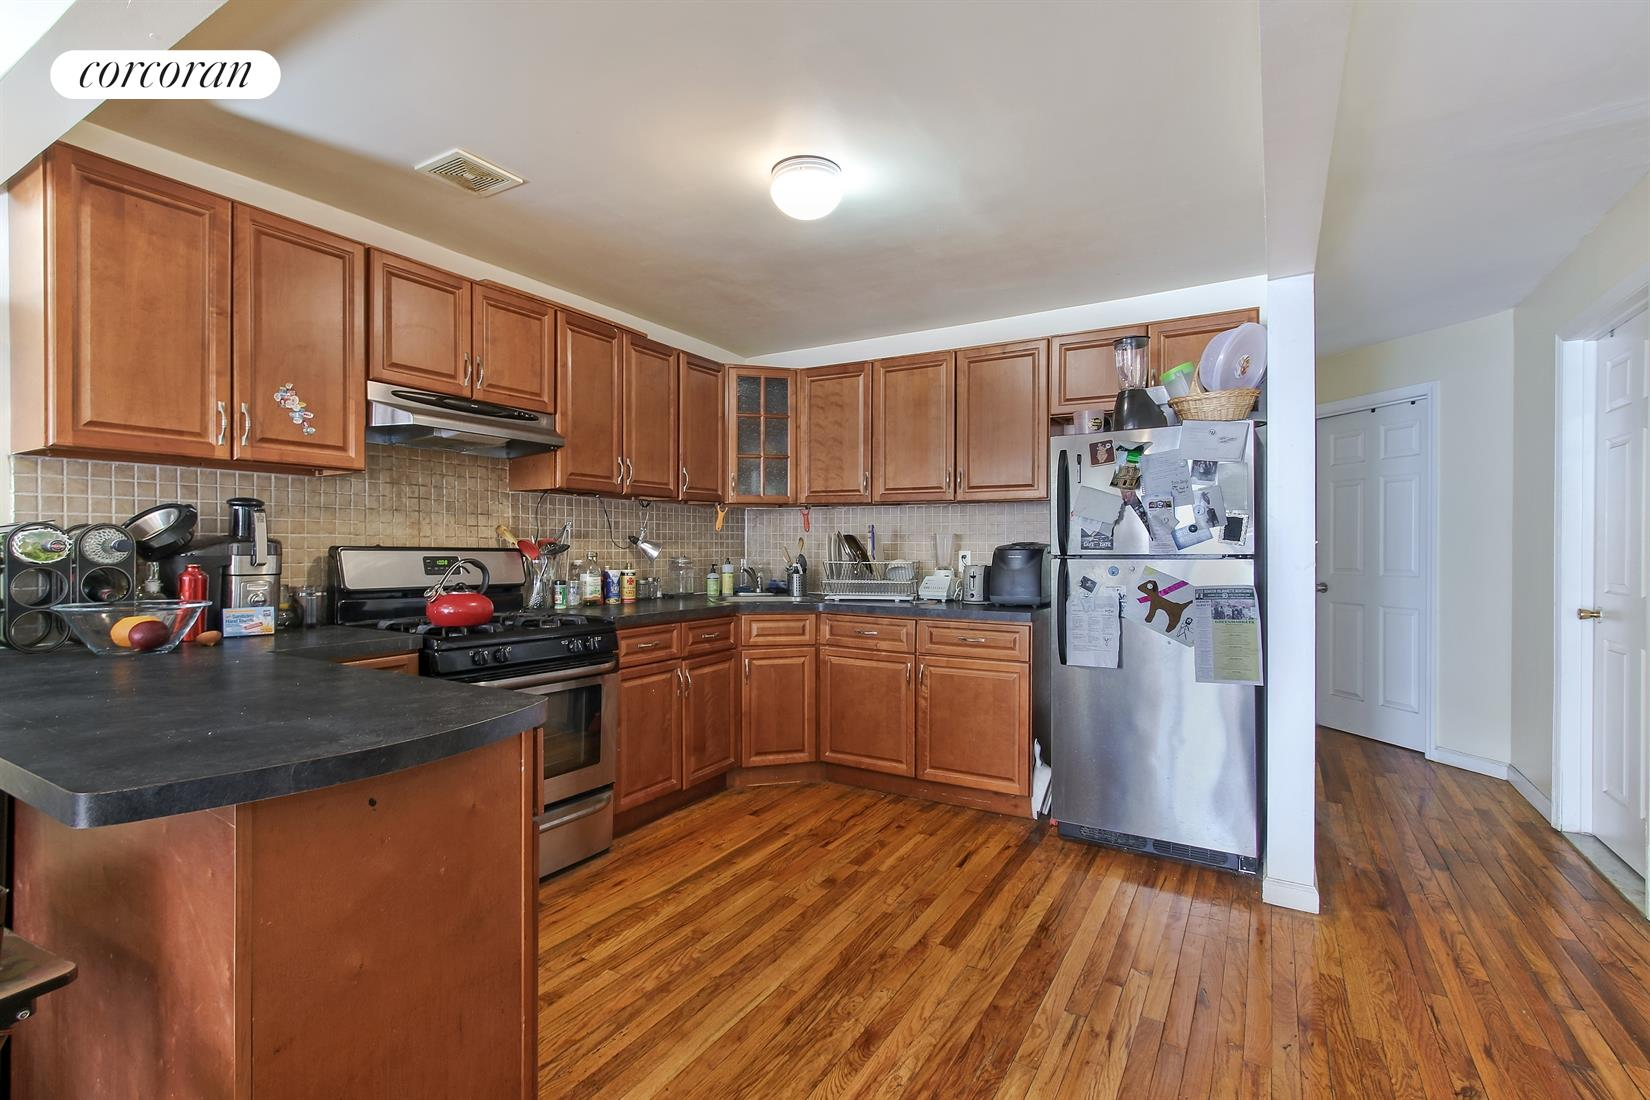 Corcoran, 128 Patchen Avenue, Bedford-Stuyvesant Real Estate ...